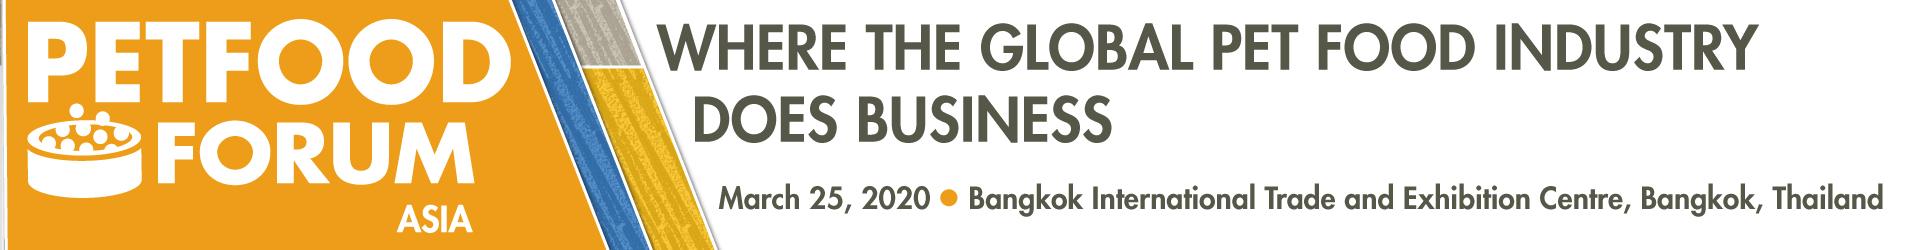 Pet Food Forum - Asia 2020 Event Banner